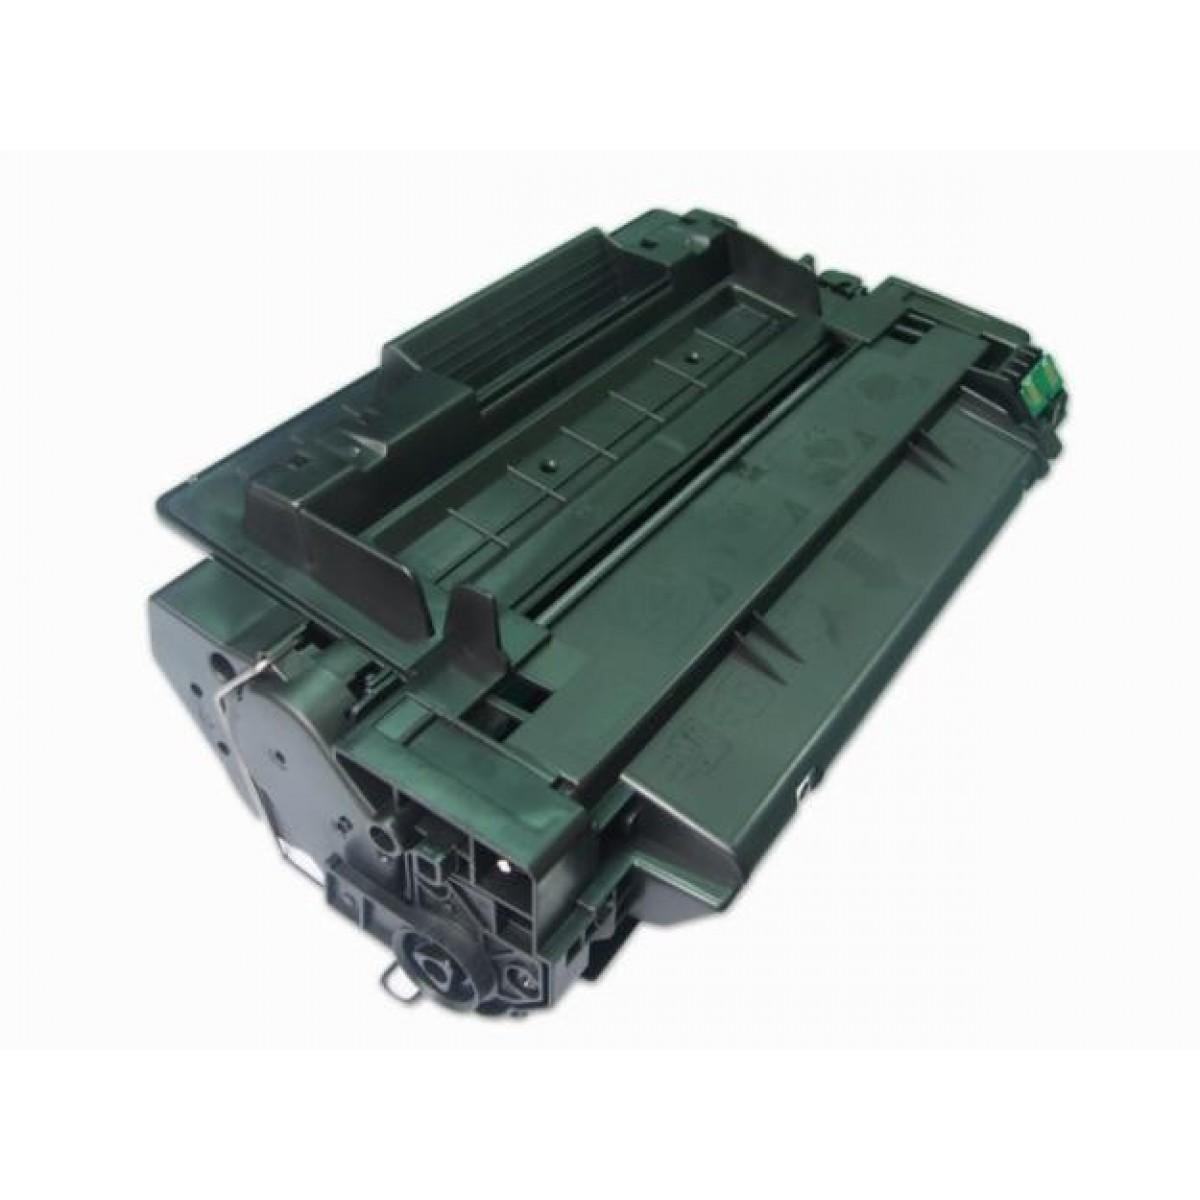 Toner  HP CE255X CE255XB HP55| P3015 P3015N P3015D P3015DN P3015X M525F | Compativel 12.5k